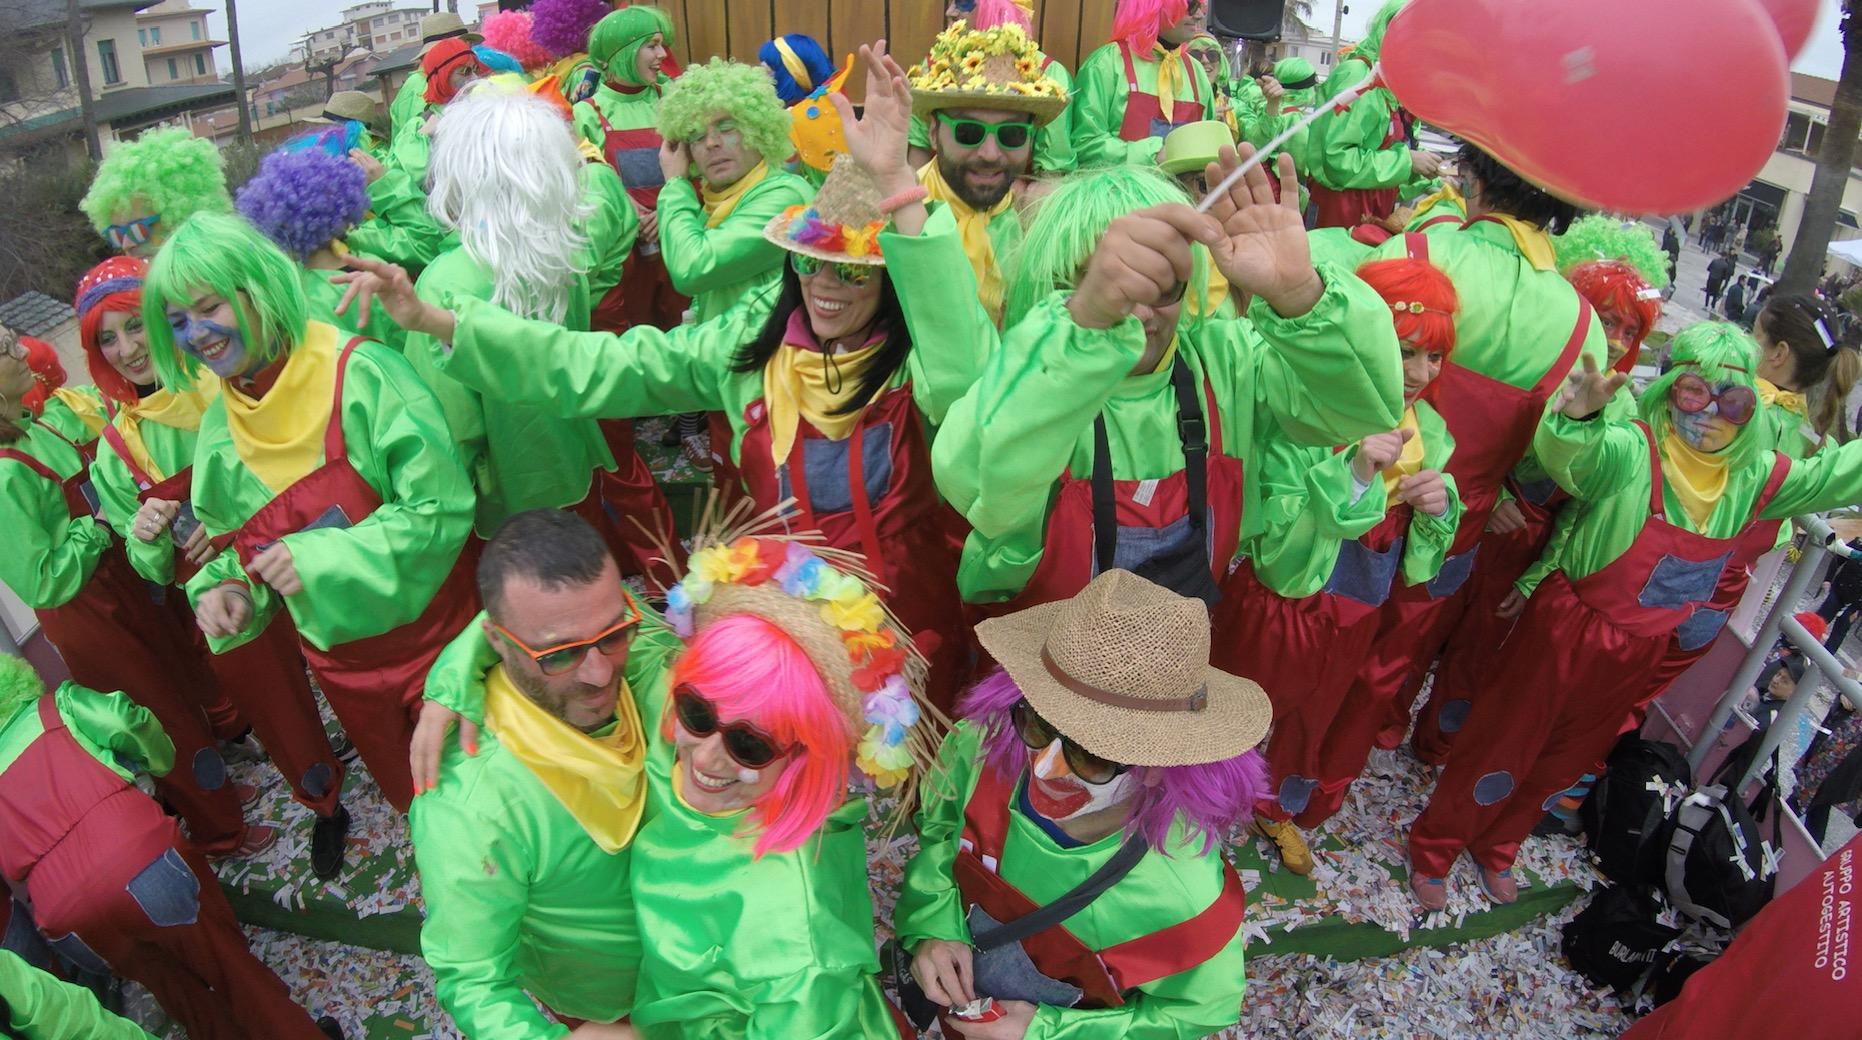 Il folle Carnevale dei Burlamatti in video